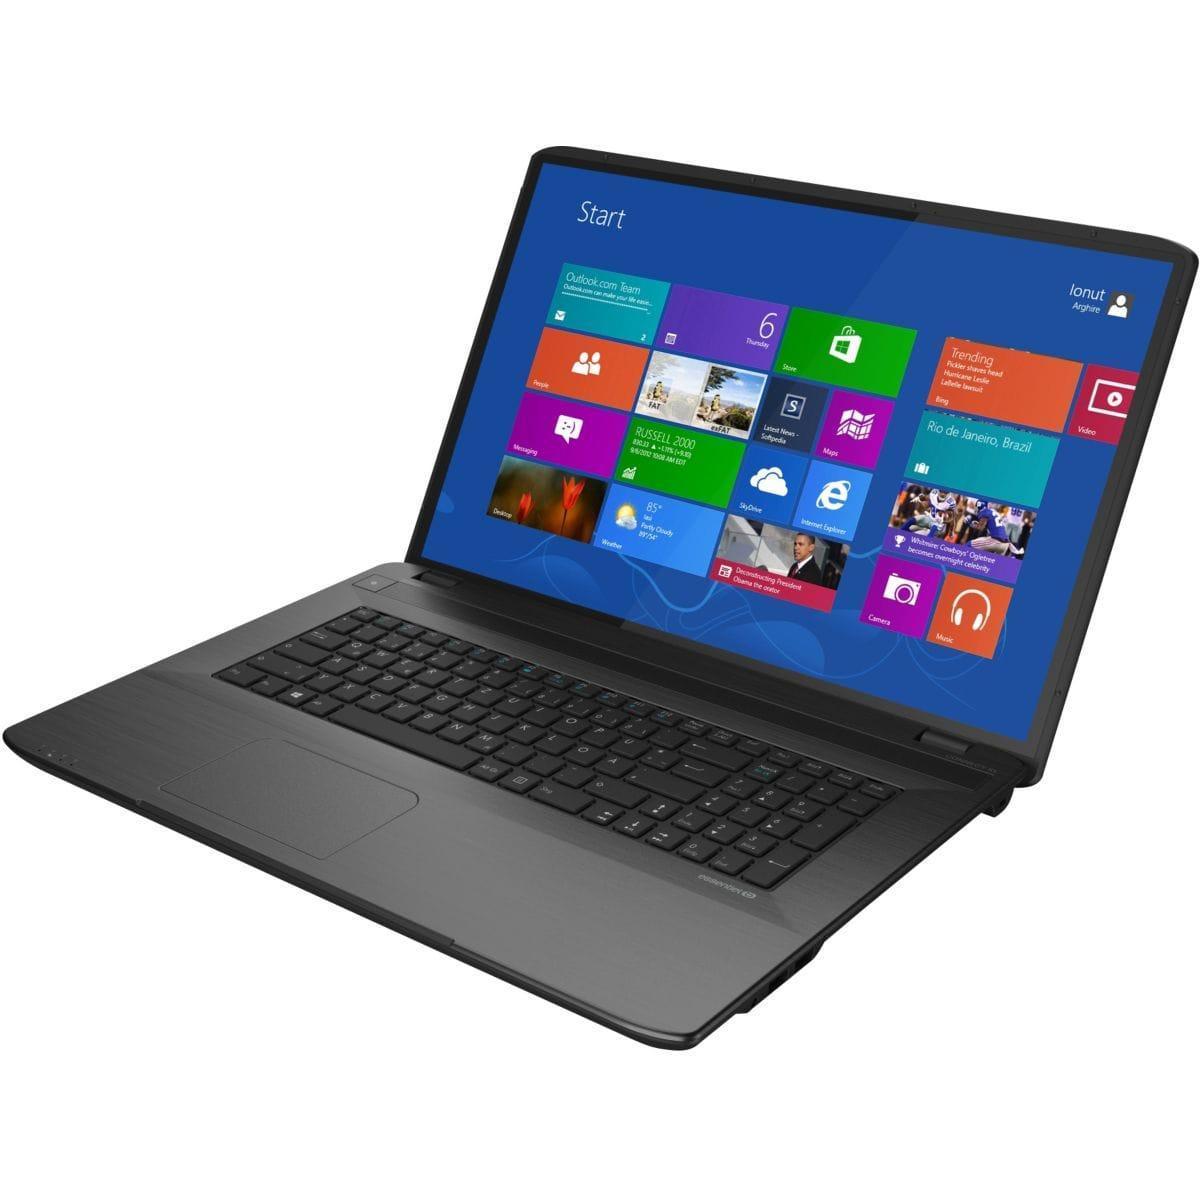 Essentiel B Smart'Mouv - Celeron N2930 1,8 GHz - HDD + SSD 1032 Go - RAM 4 Go - AZERTY